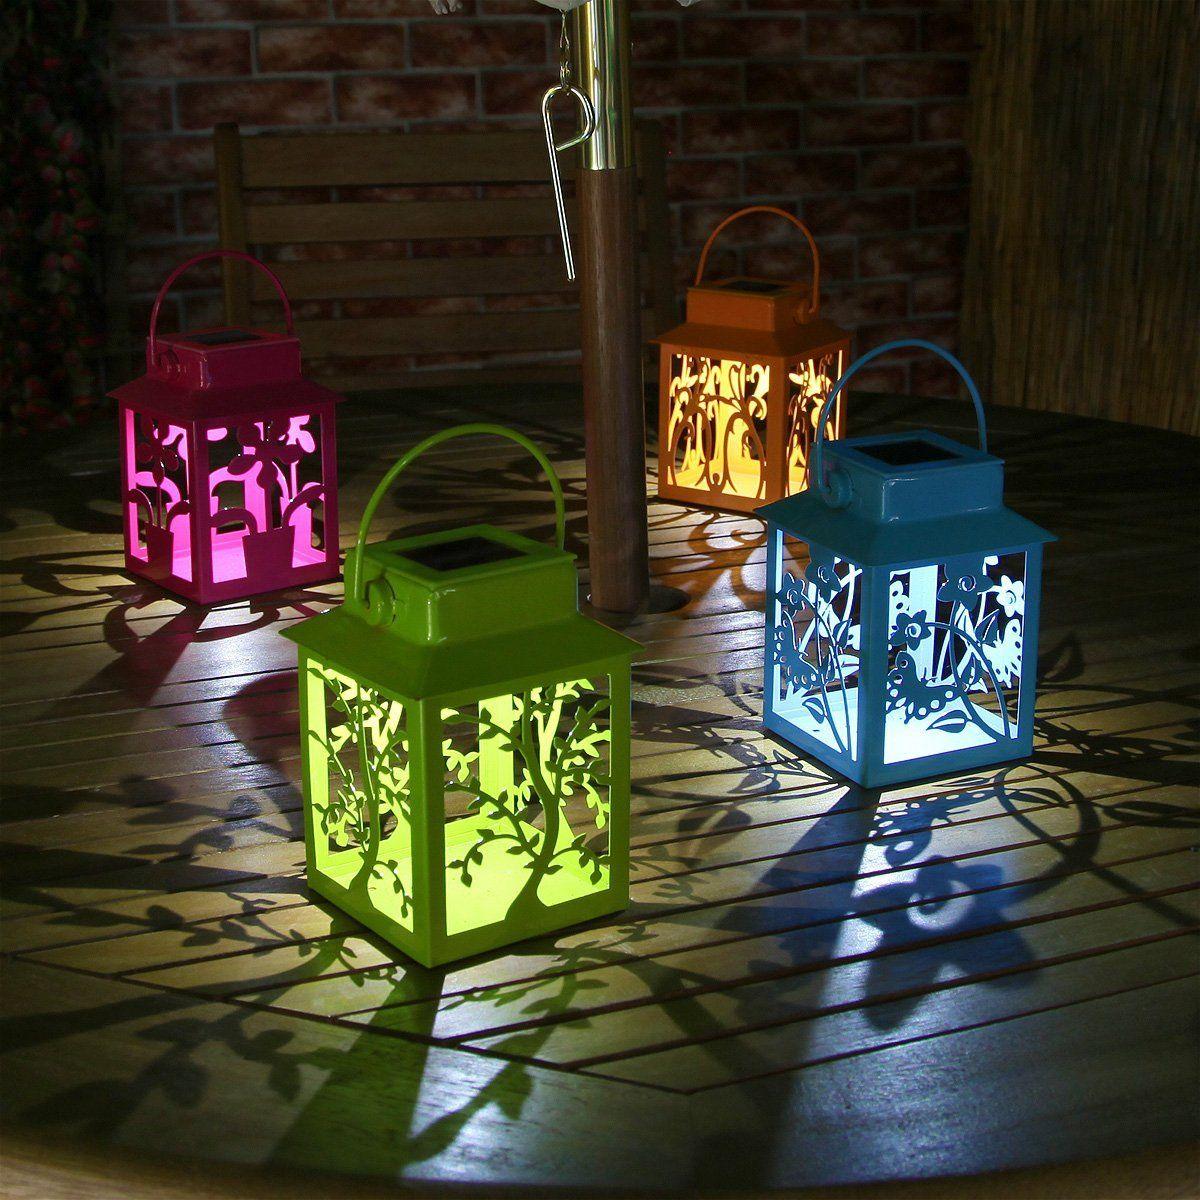 4 Coloured Solar Powered Metal Outdoor Lantern Lights: Amazon.co.uk ...